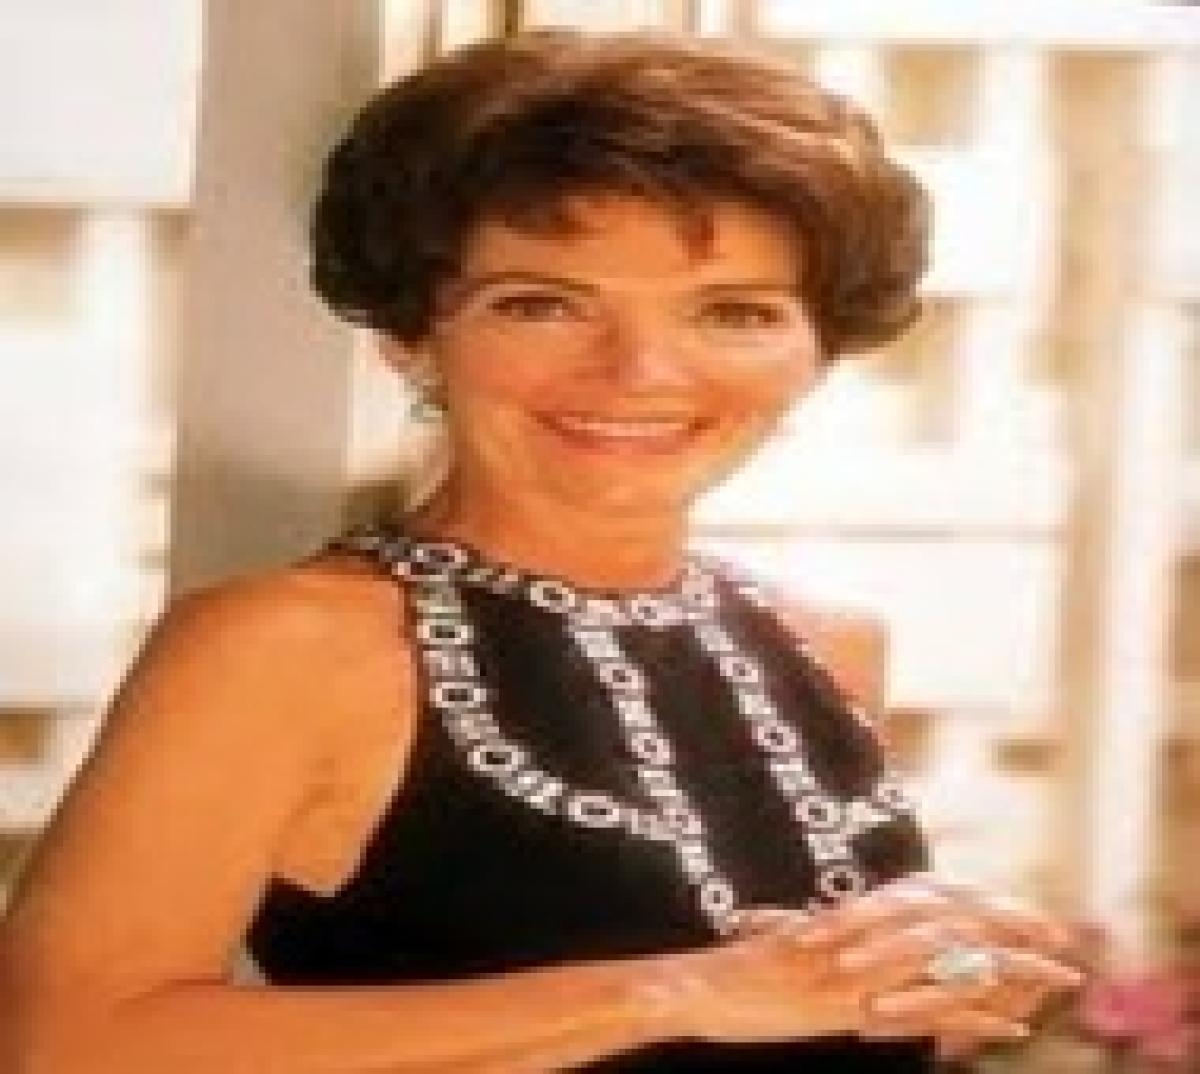 Nancy Reagan passes away at 94